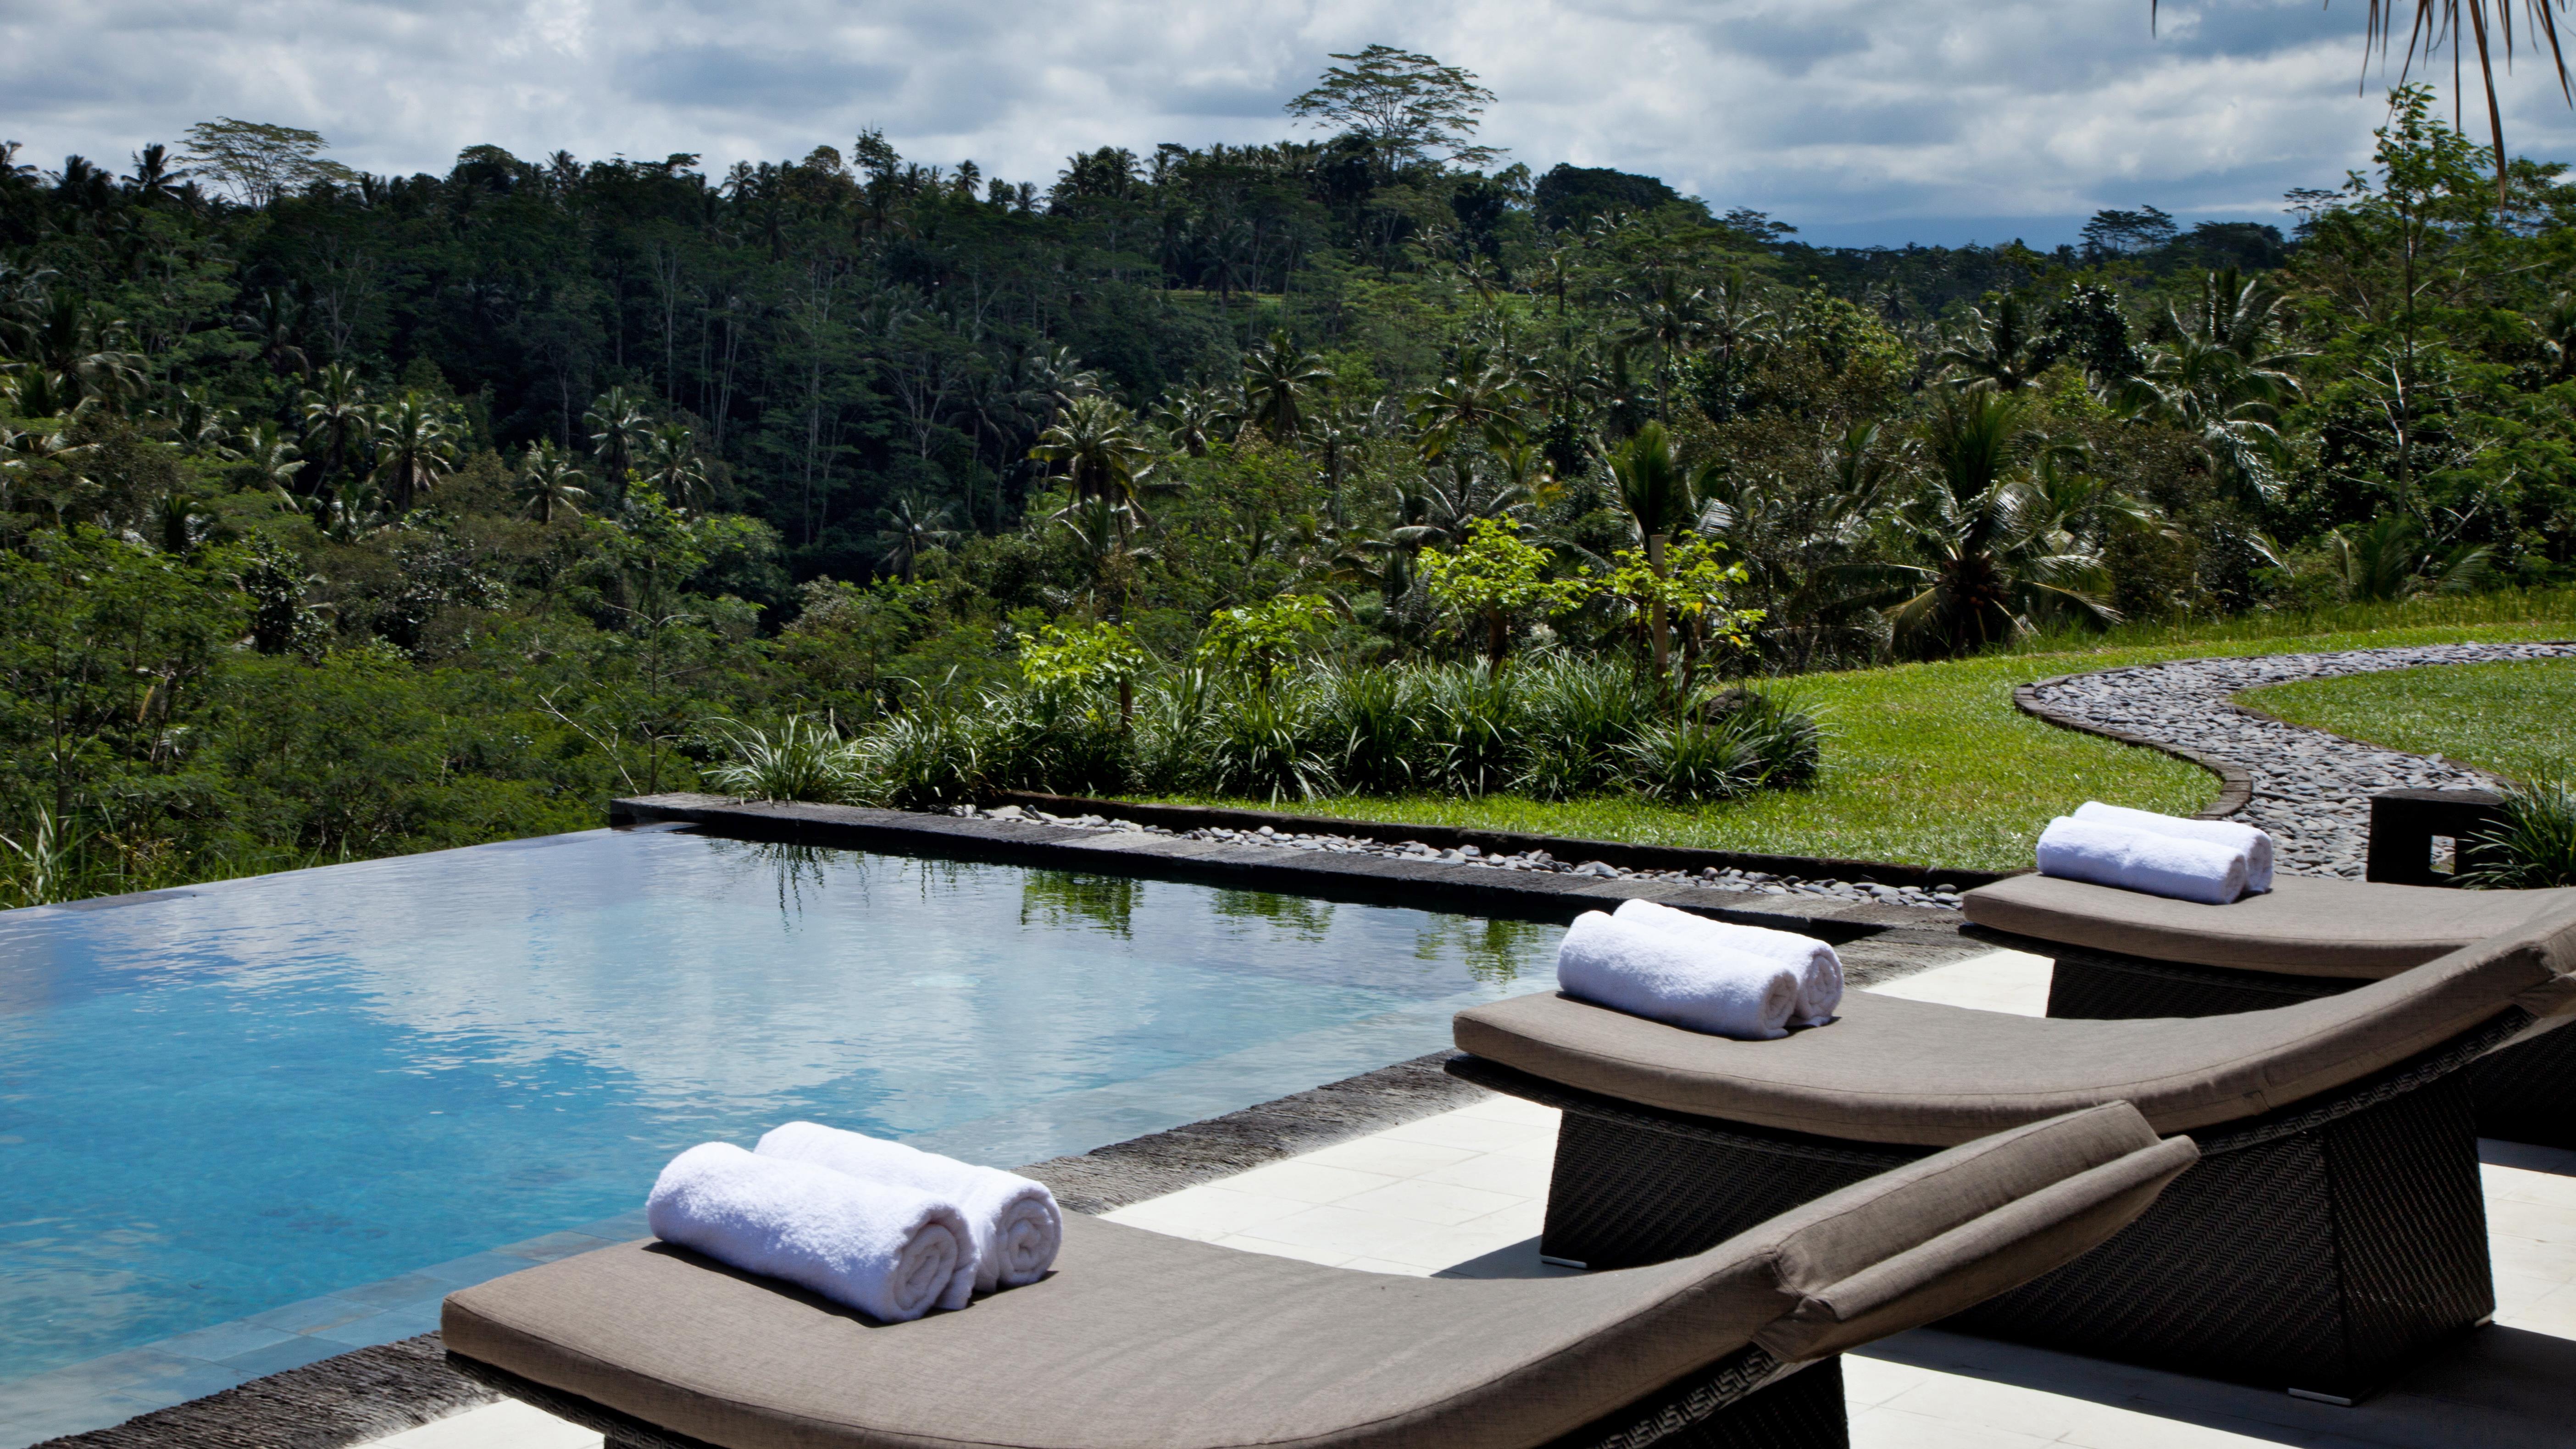 Rent Villa Pondok Sapi 3 Bedrooms Sleeps 6 Pool